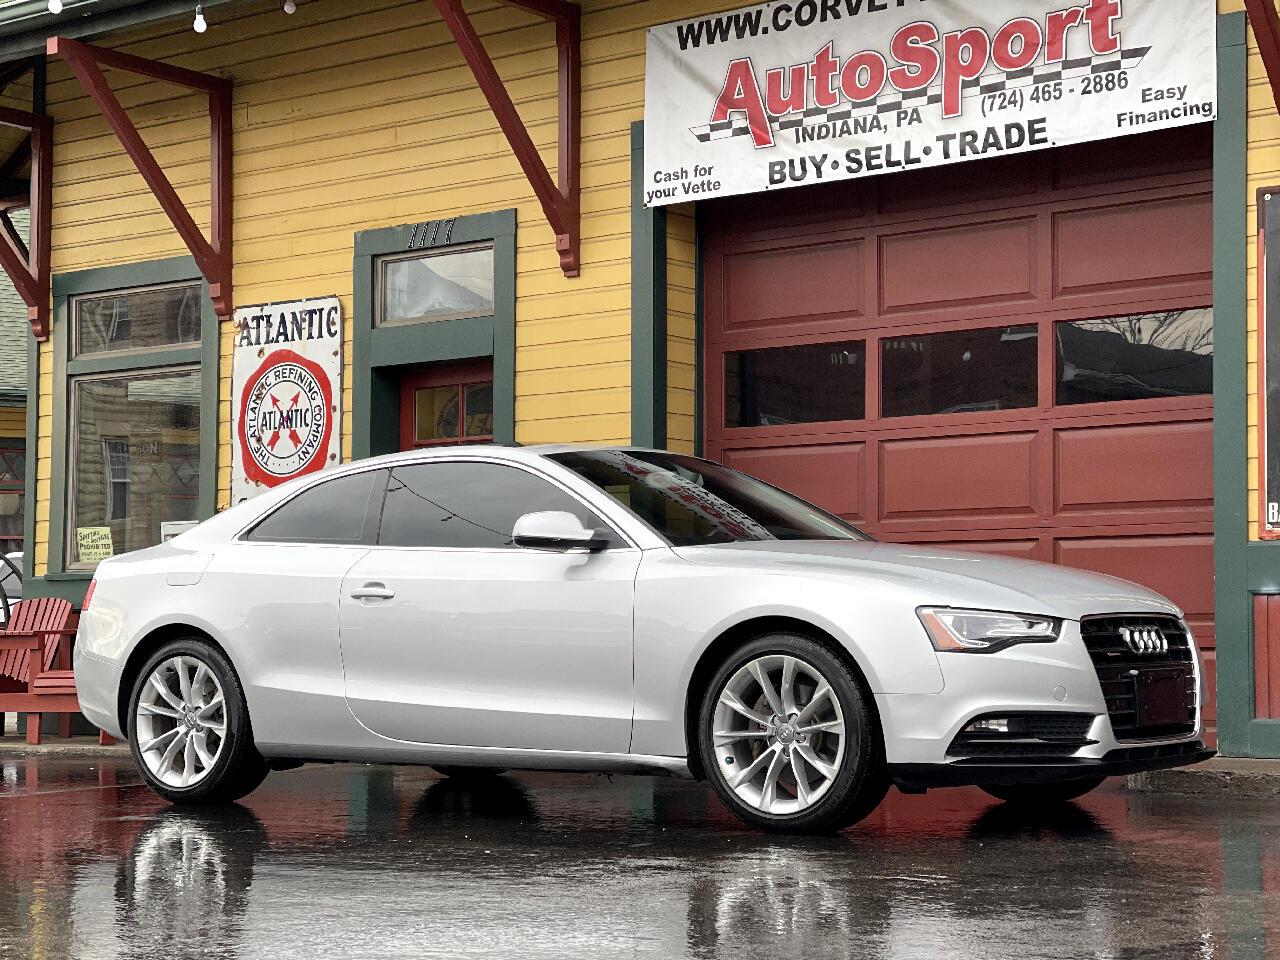 Audi A5 Coupe 2.0T quattro Tiptronic 2014